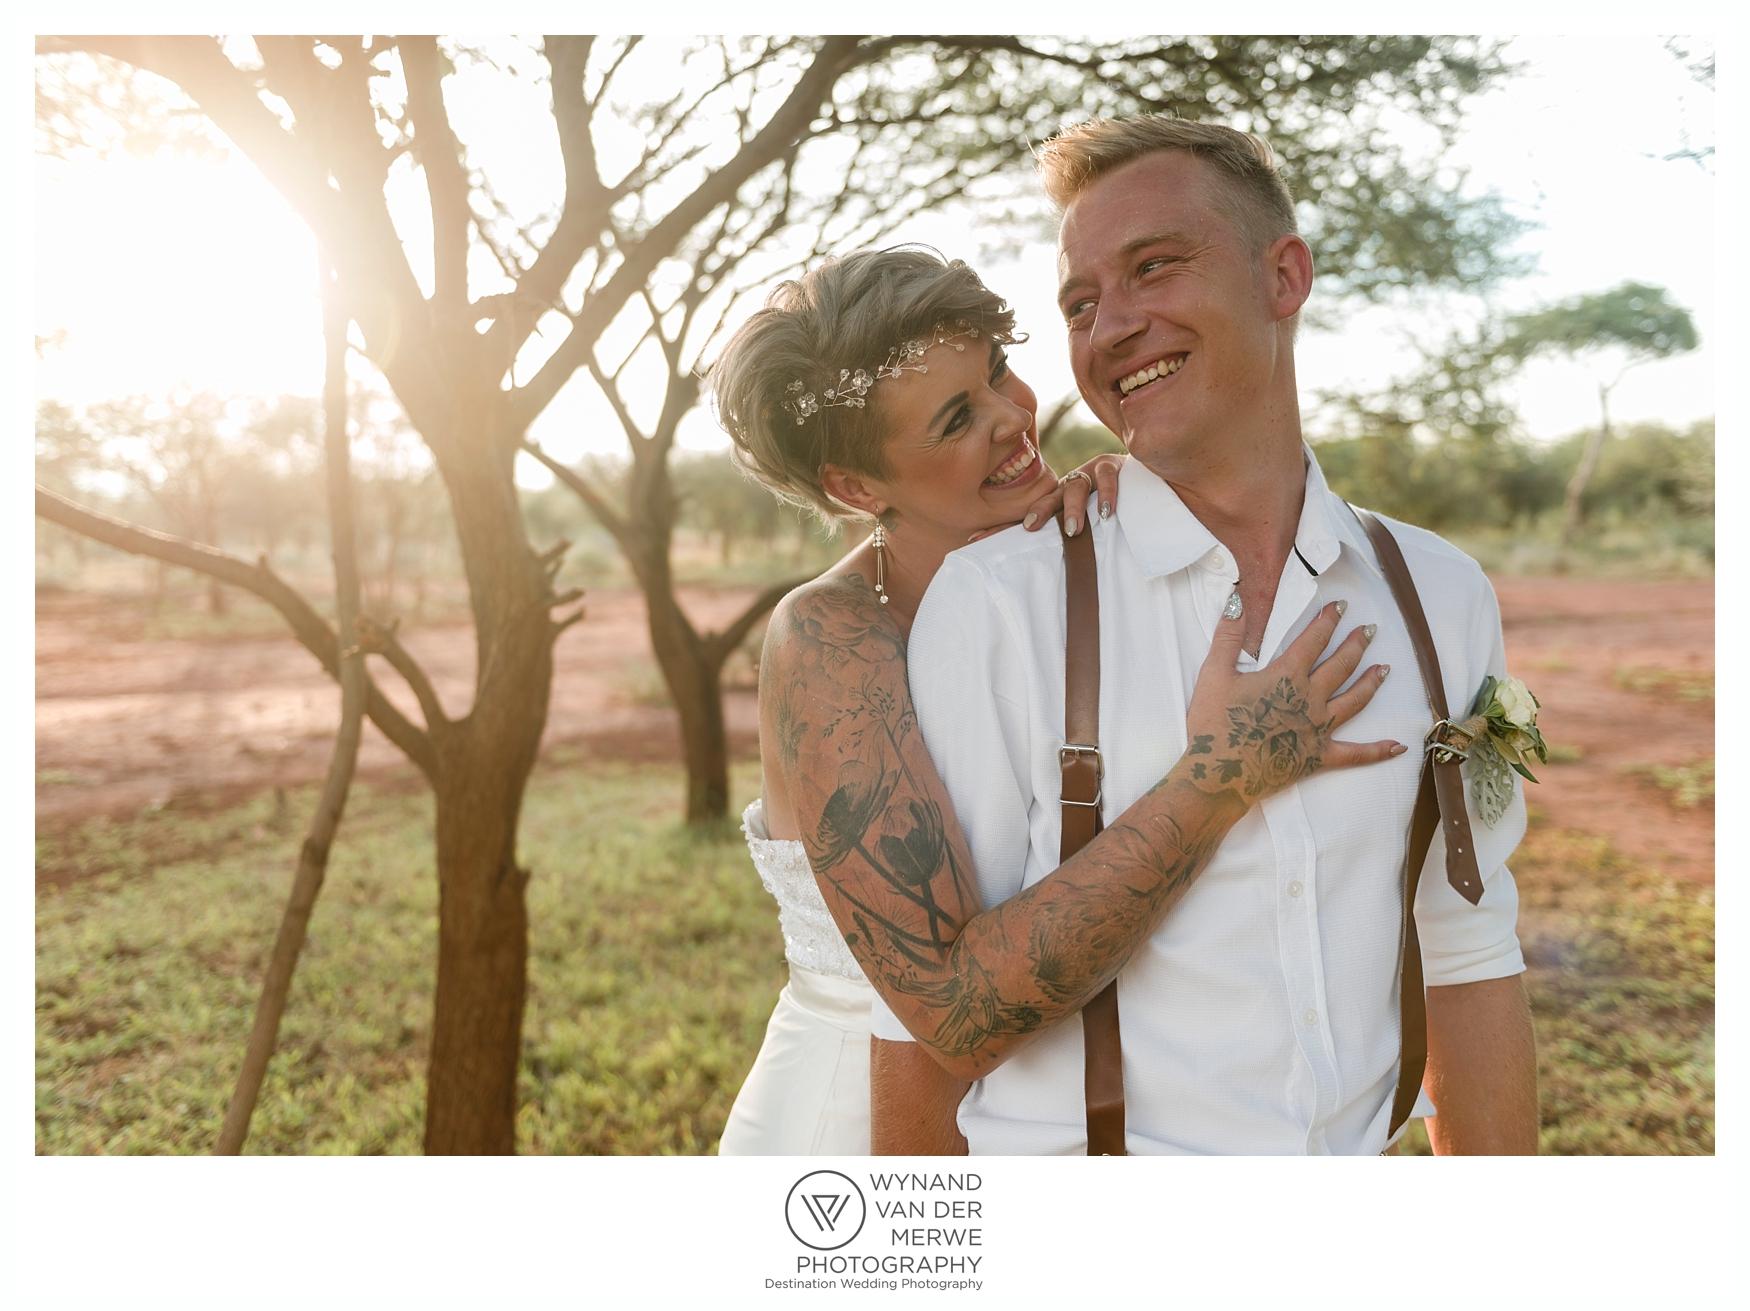 WynandvanderMerwe_weddingphotography_bushveldwedding_northam_bushveld_limpopowedding_limpopo_southafrica-241.jpg